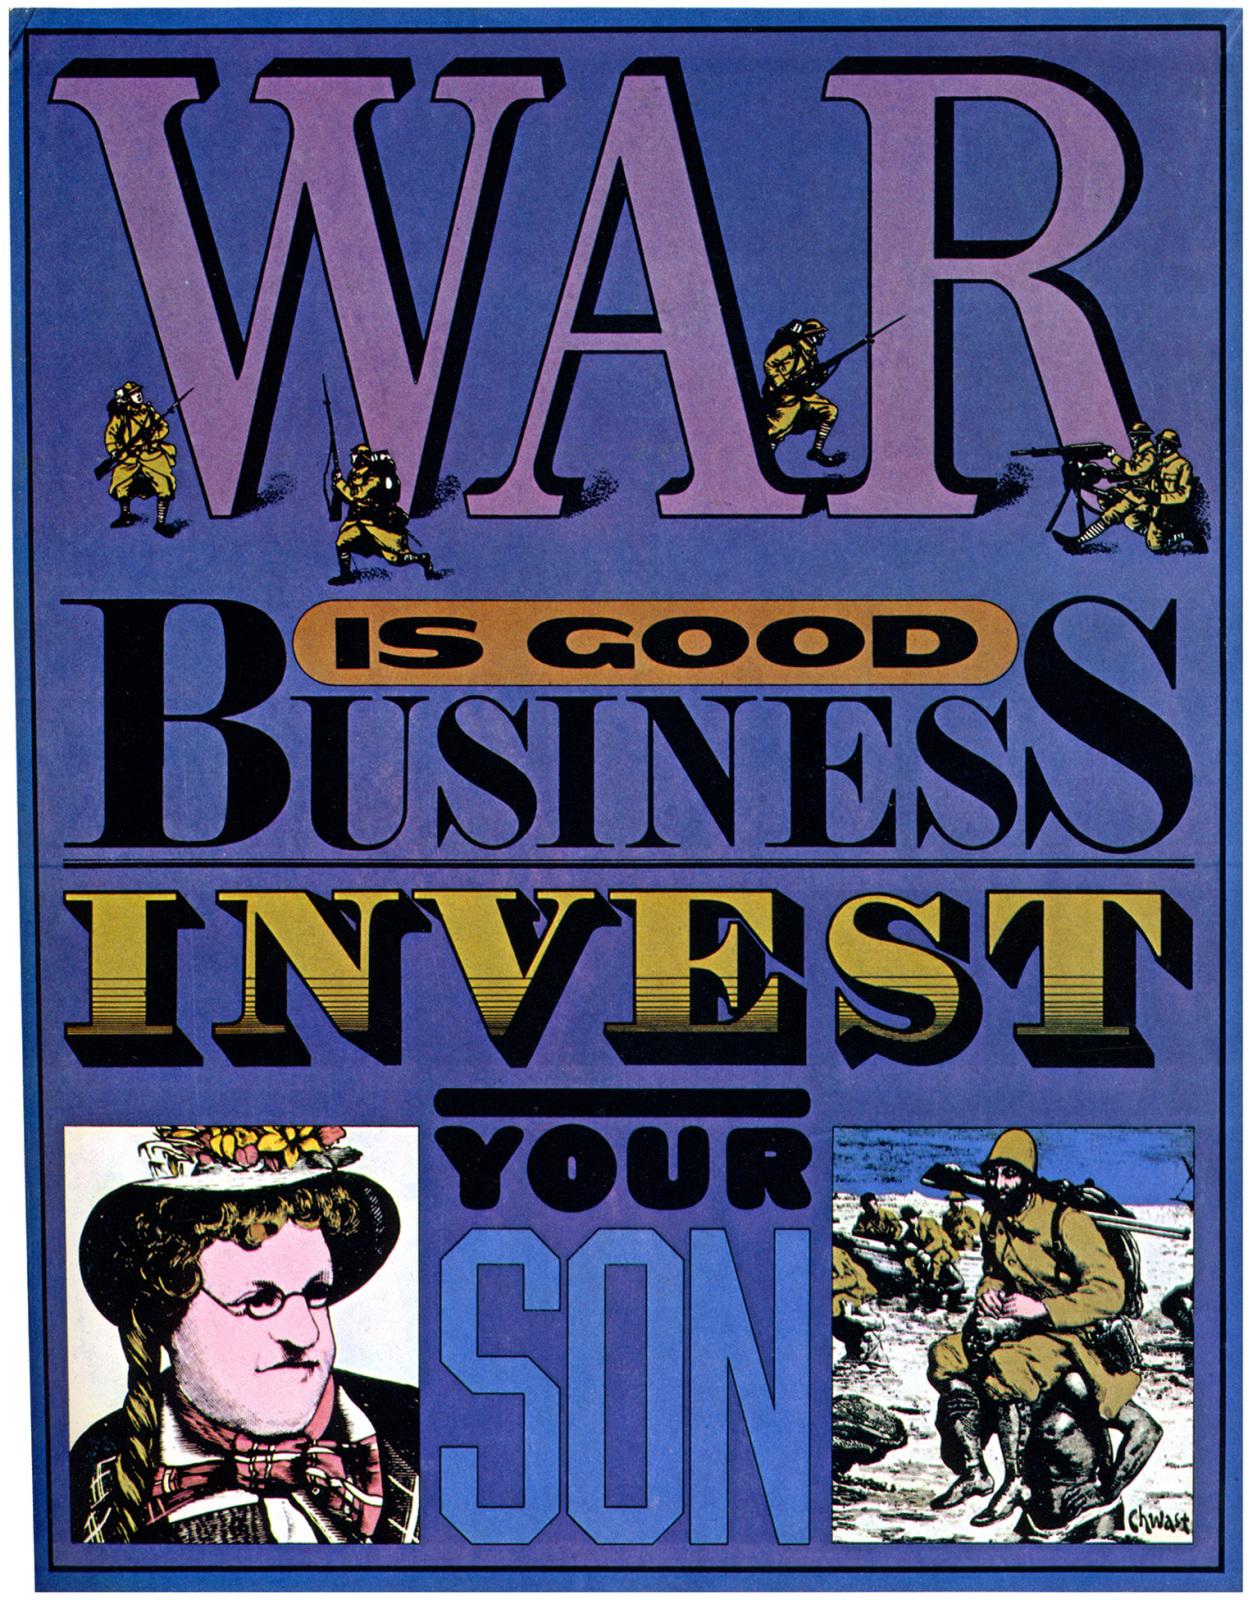 """War Is Good Business"", Seymour Chwast, 1968"